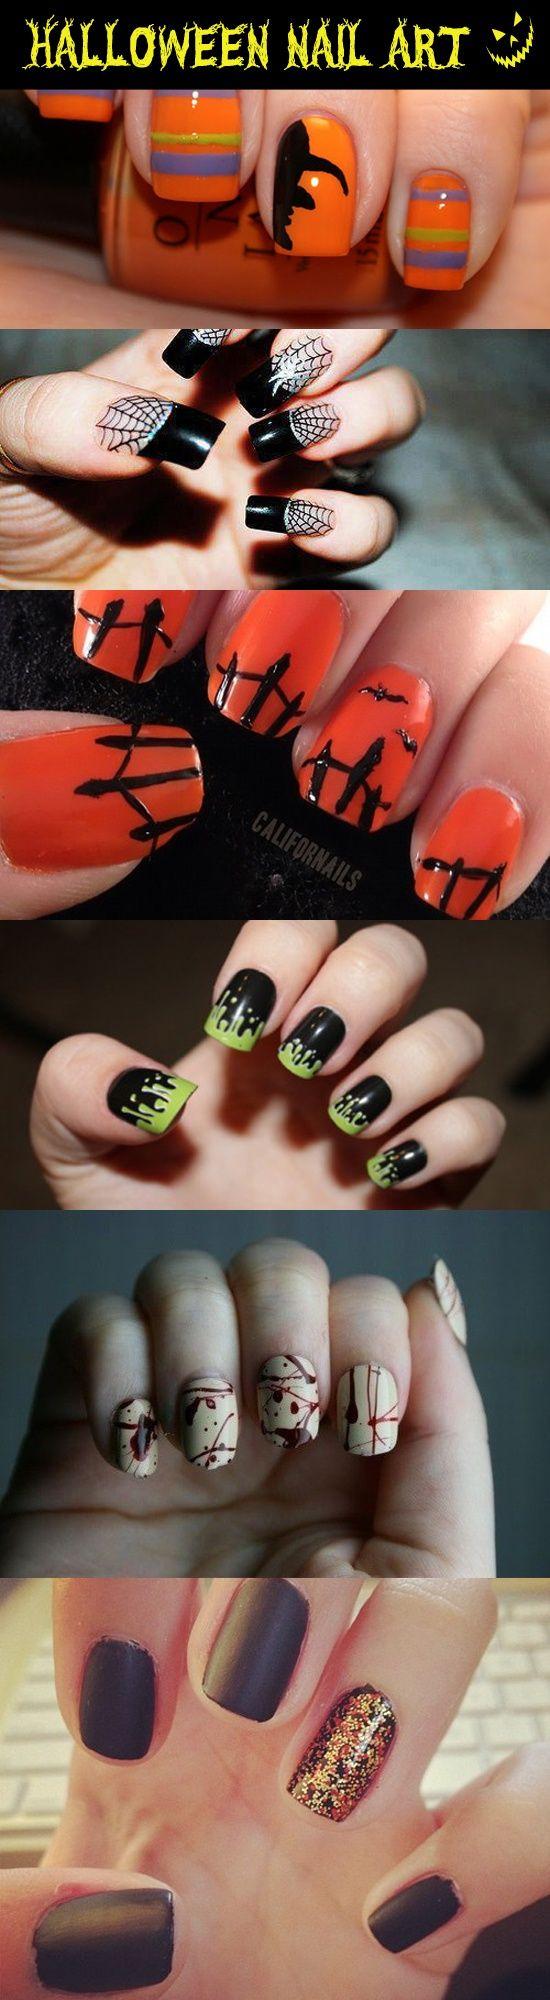 Halloween Nail Art Ideas : Unique Halloween Nails, Nail ...